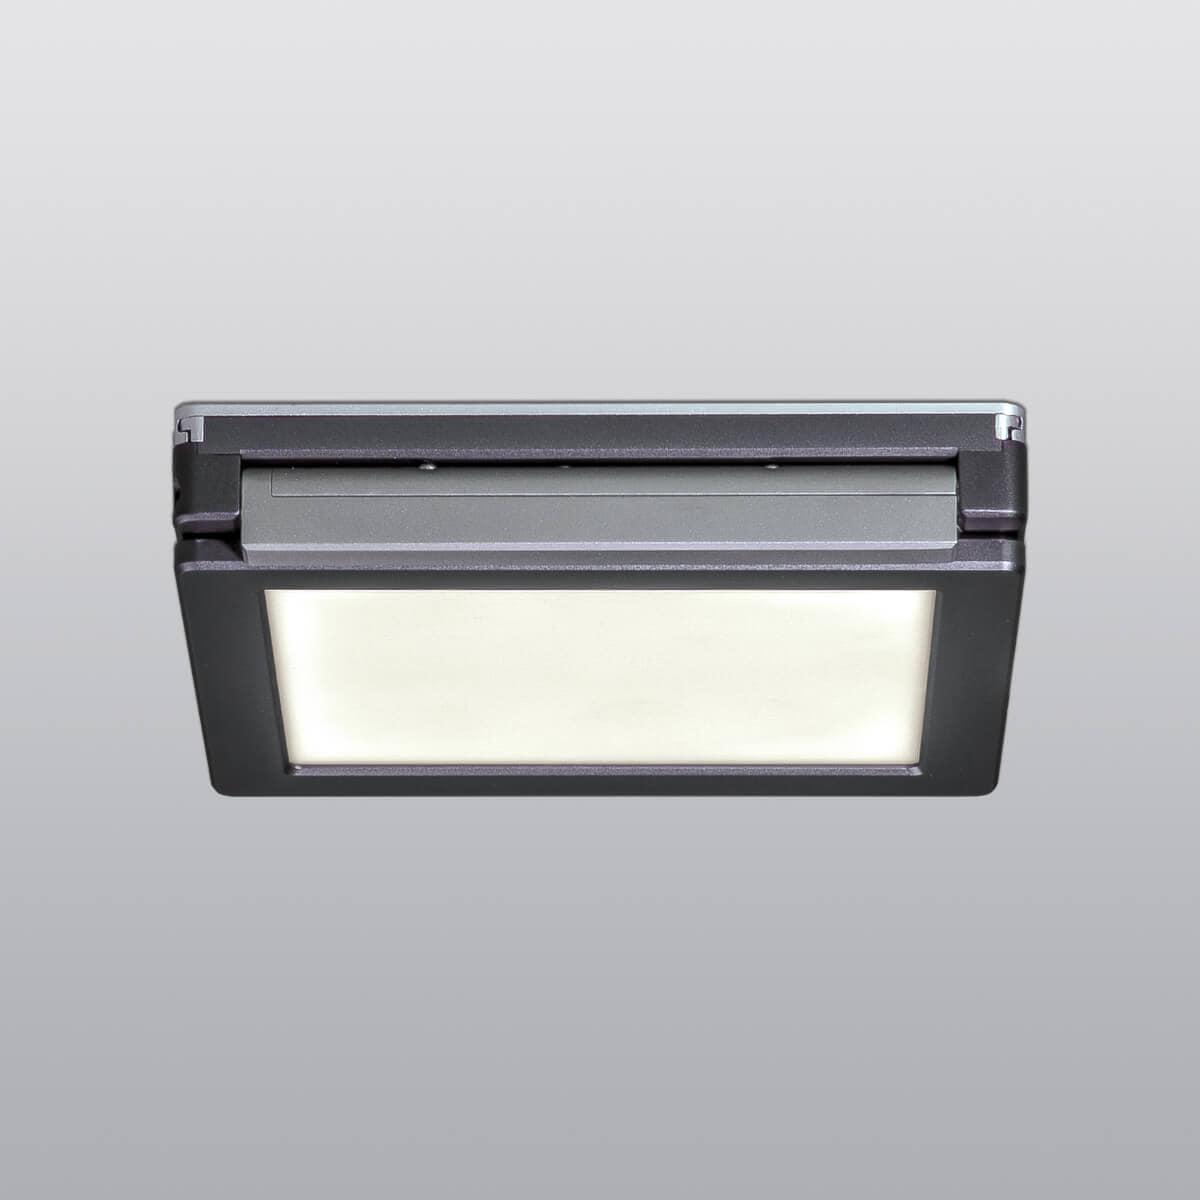 OLED luminaire SquareOne fromGamma Illumination